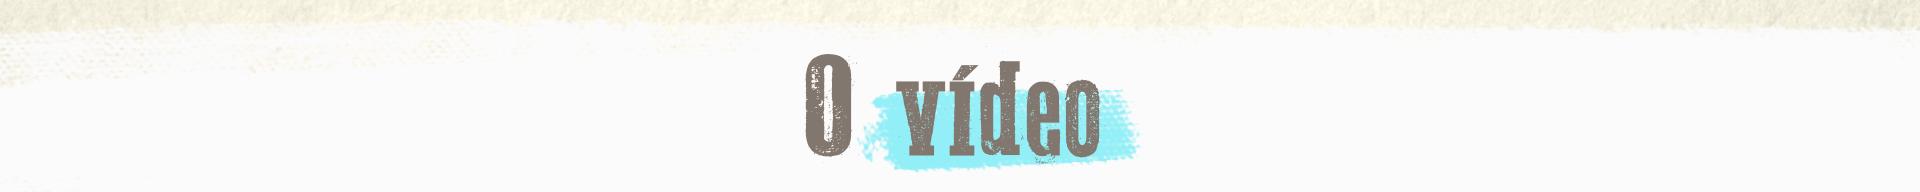 o video